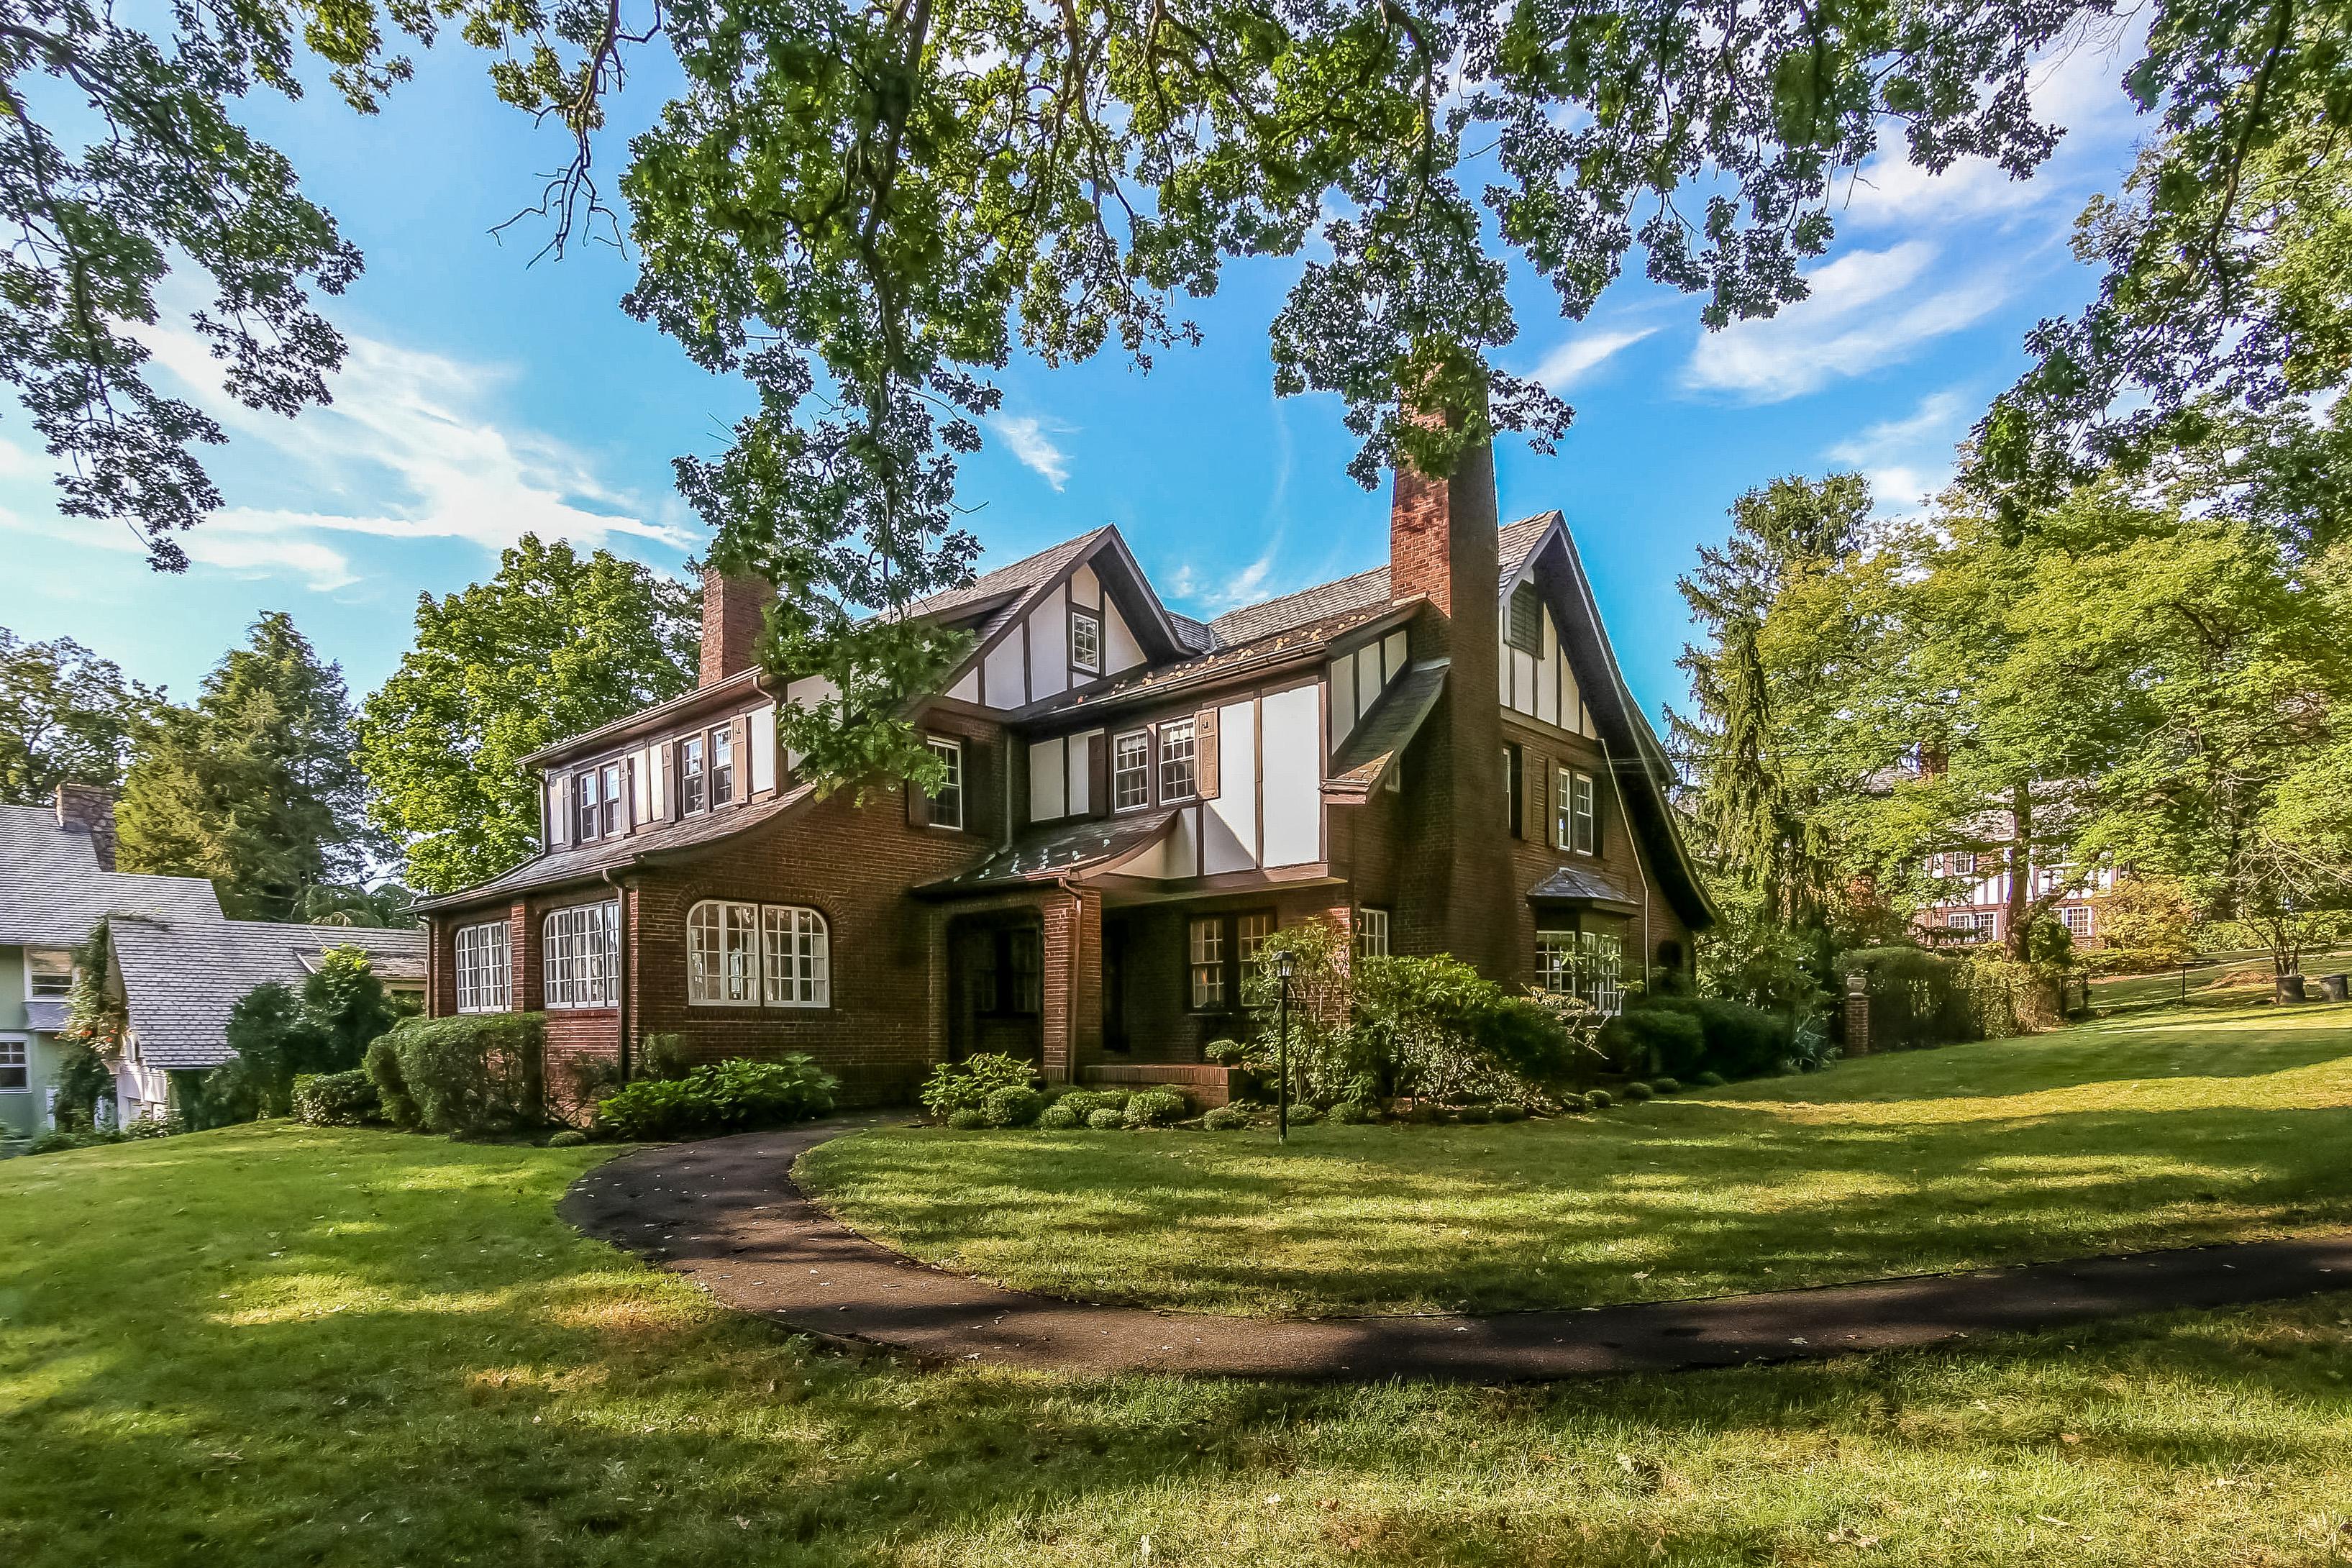 Single Family Home for Sale at Classic Tudor in Pelham 311 Monterey Avenue Pelham, New York, 10803 United States